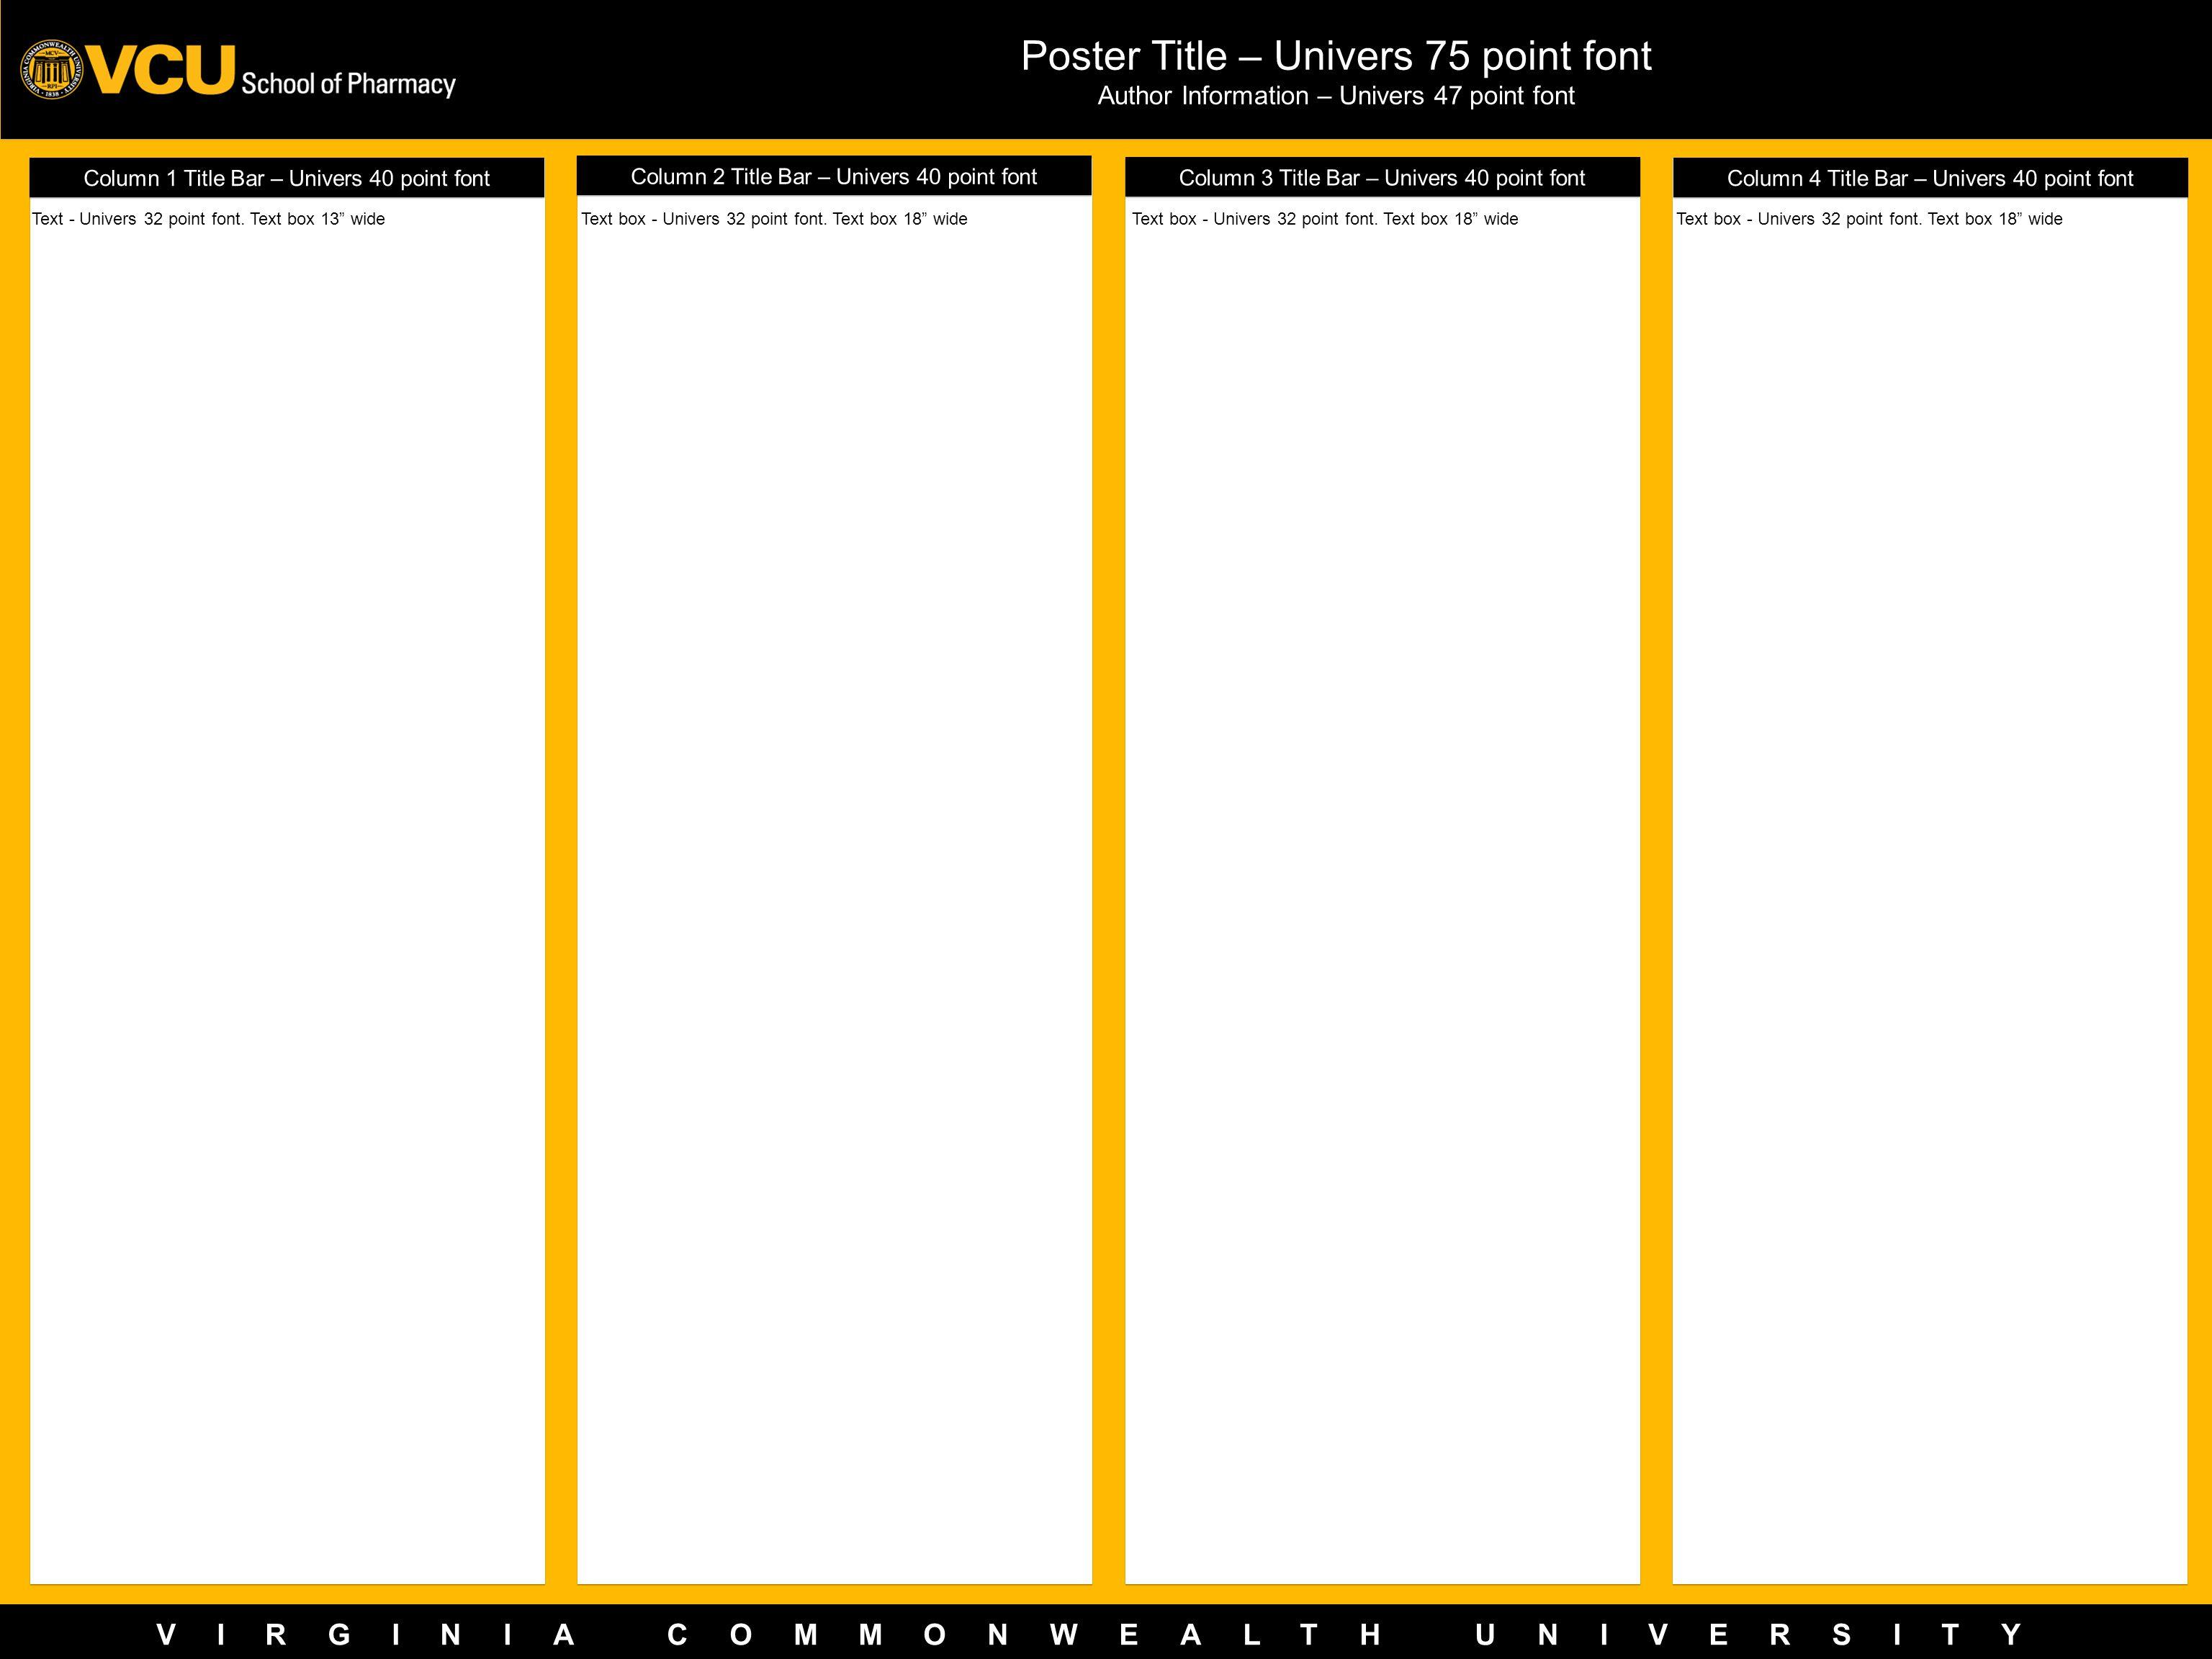 VIRGINIA COMMONWEALTH UNIVERSITY Column 1 Title Bar – Univers 40 point font Poster Title – Univers 75 point font Author Information – Univers 47 point font Text - Univers 32 point font.